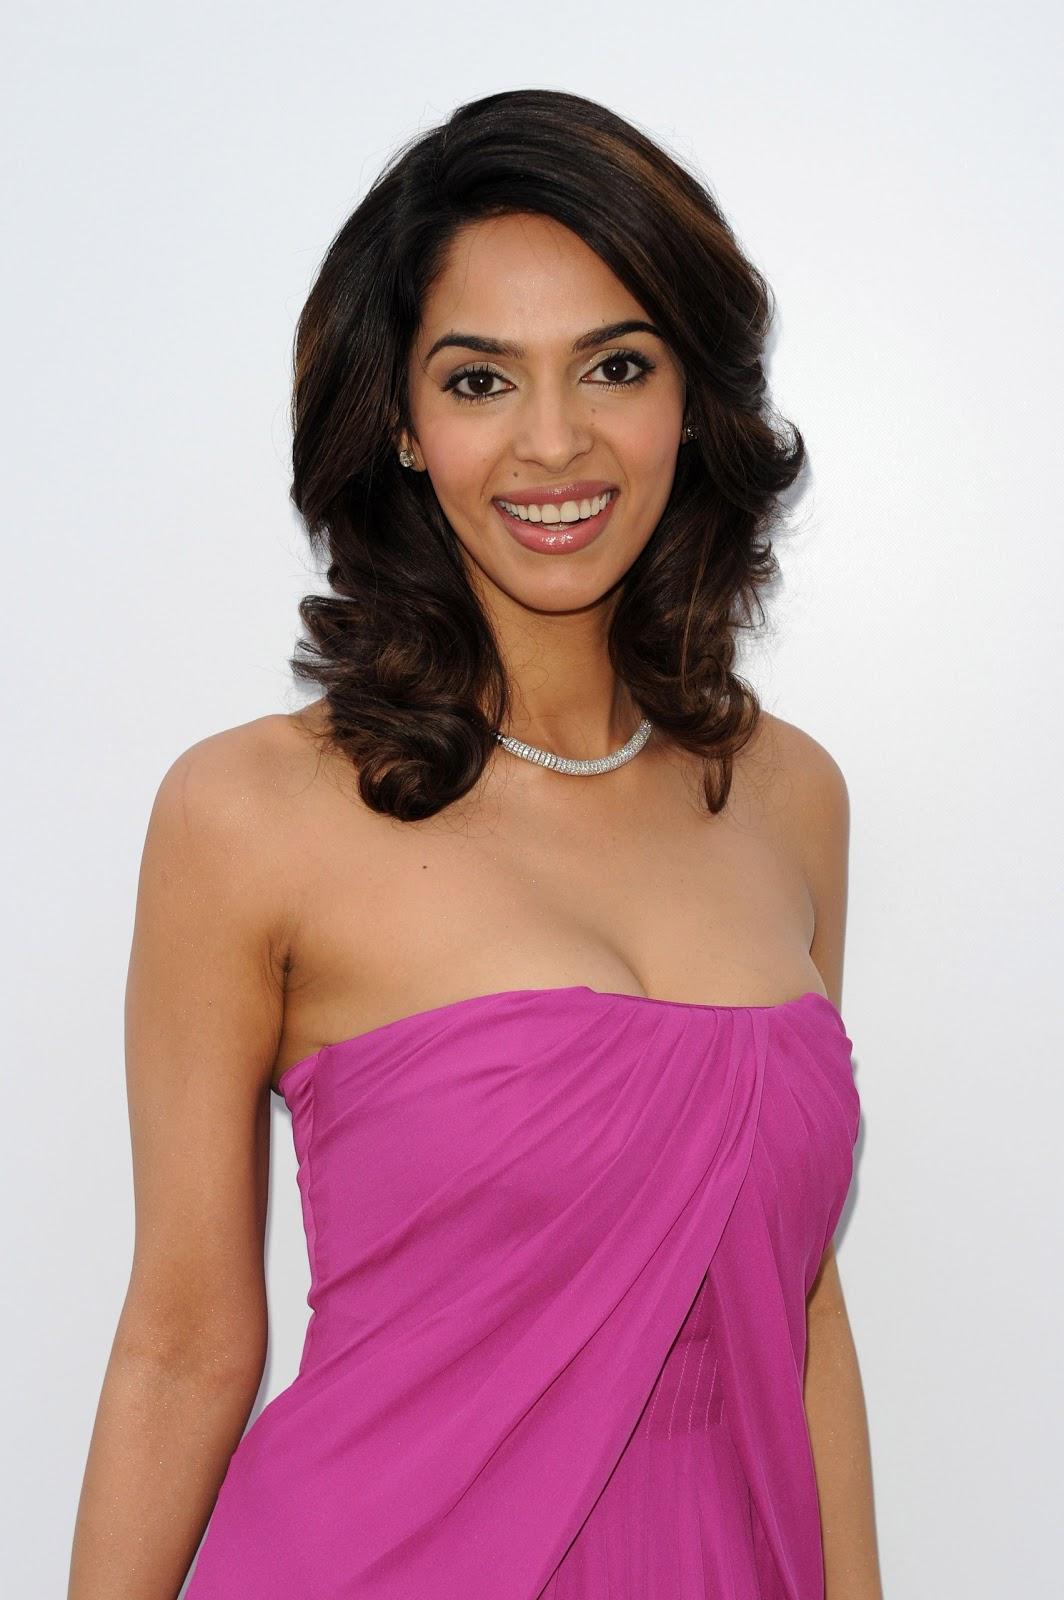 Malika sherawat sexi image-9328